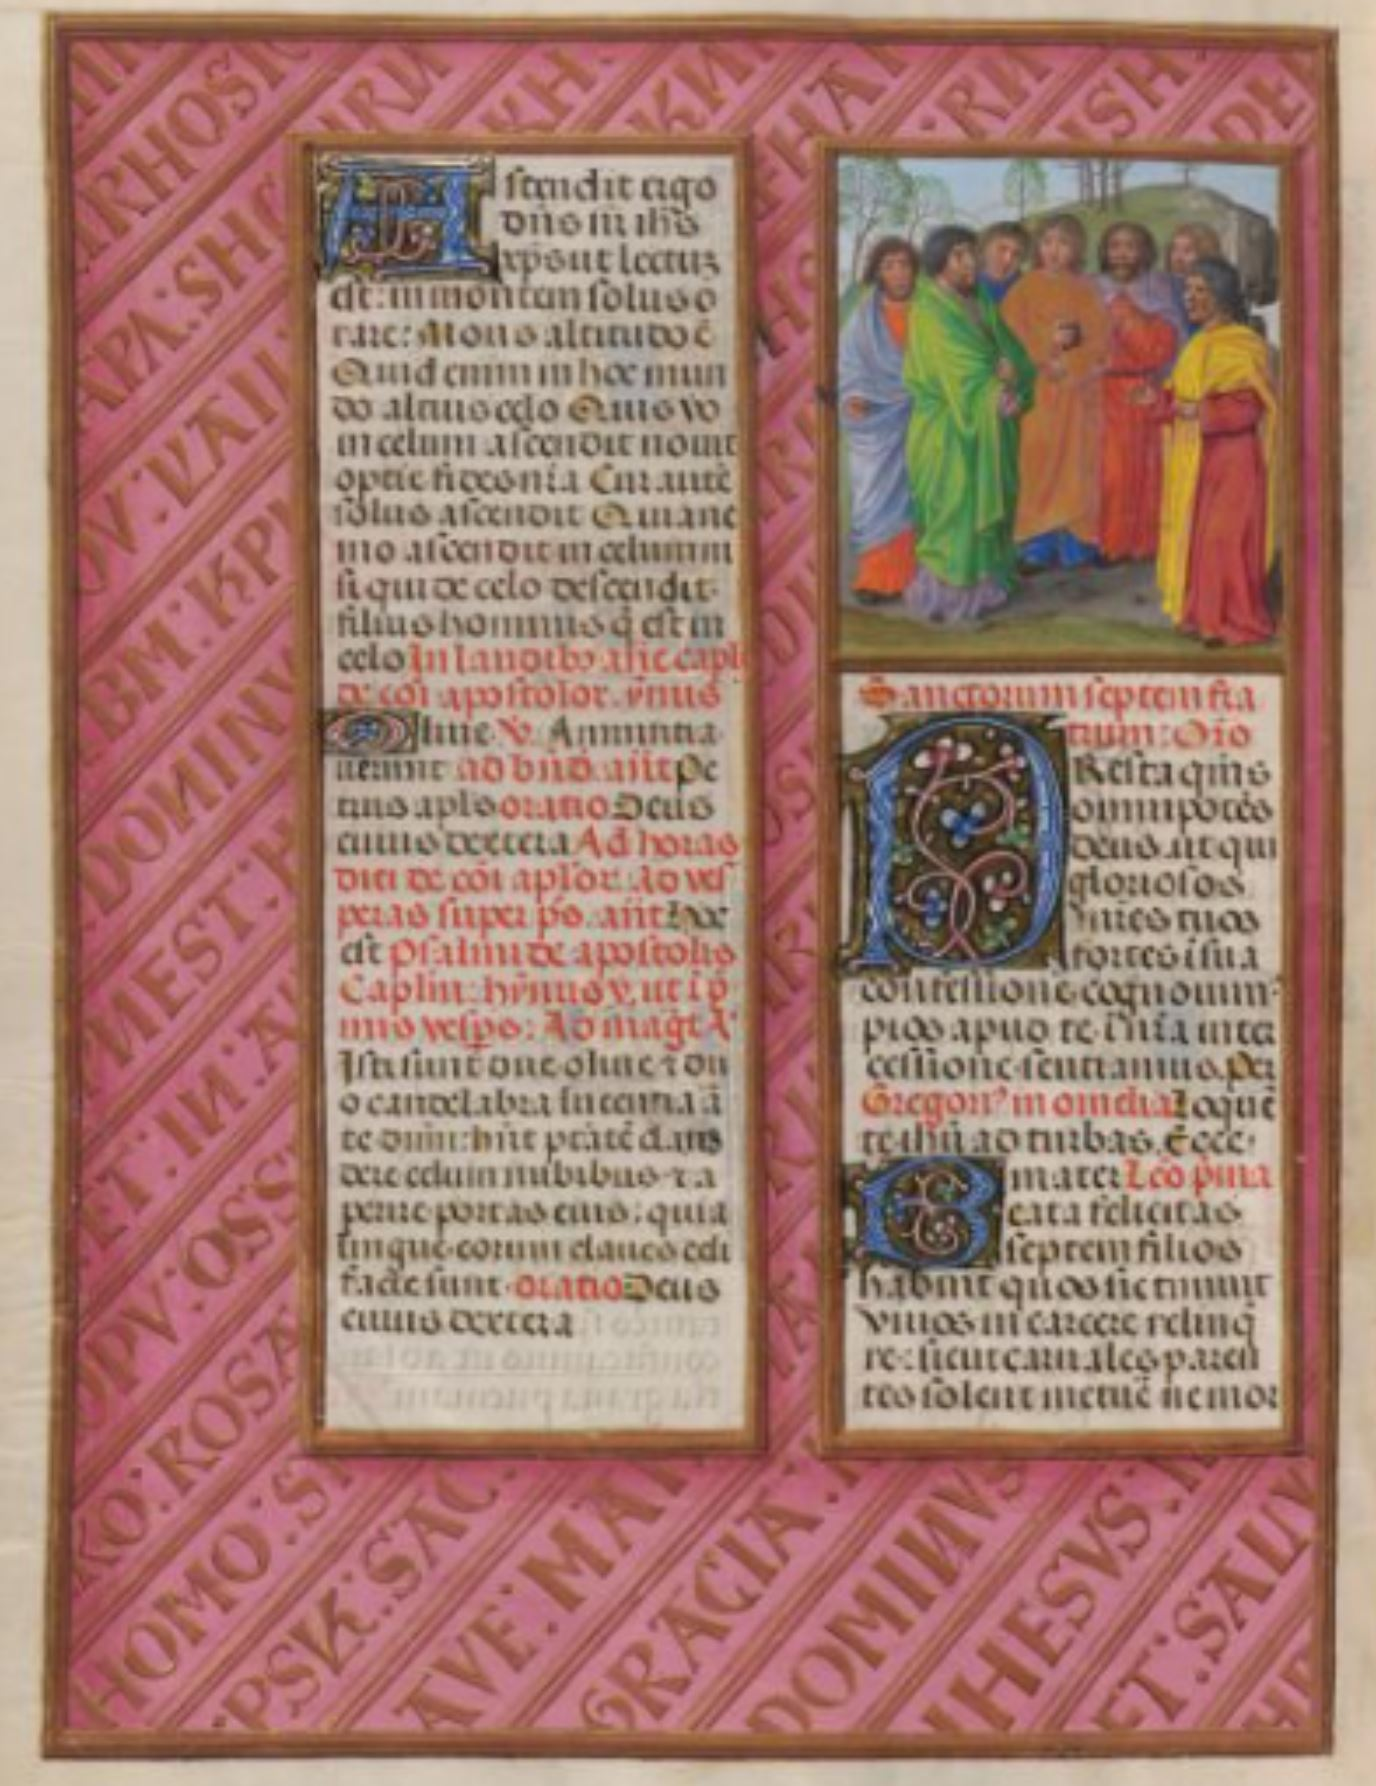 1497 ca Breviaire Isabelle la Catholique BL Add MS 18851 fol 404v The seven brothers